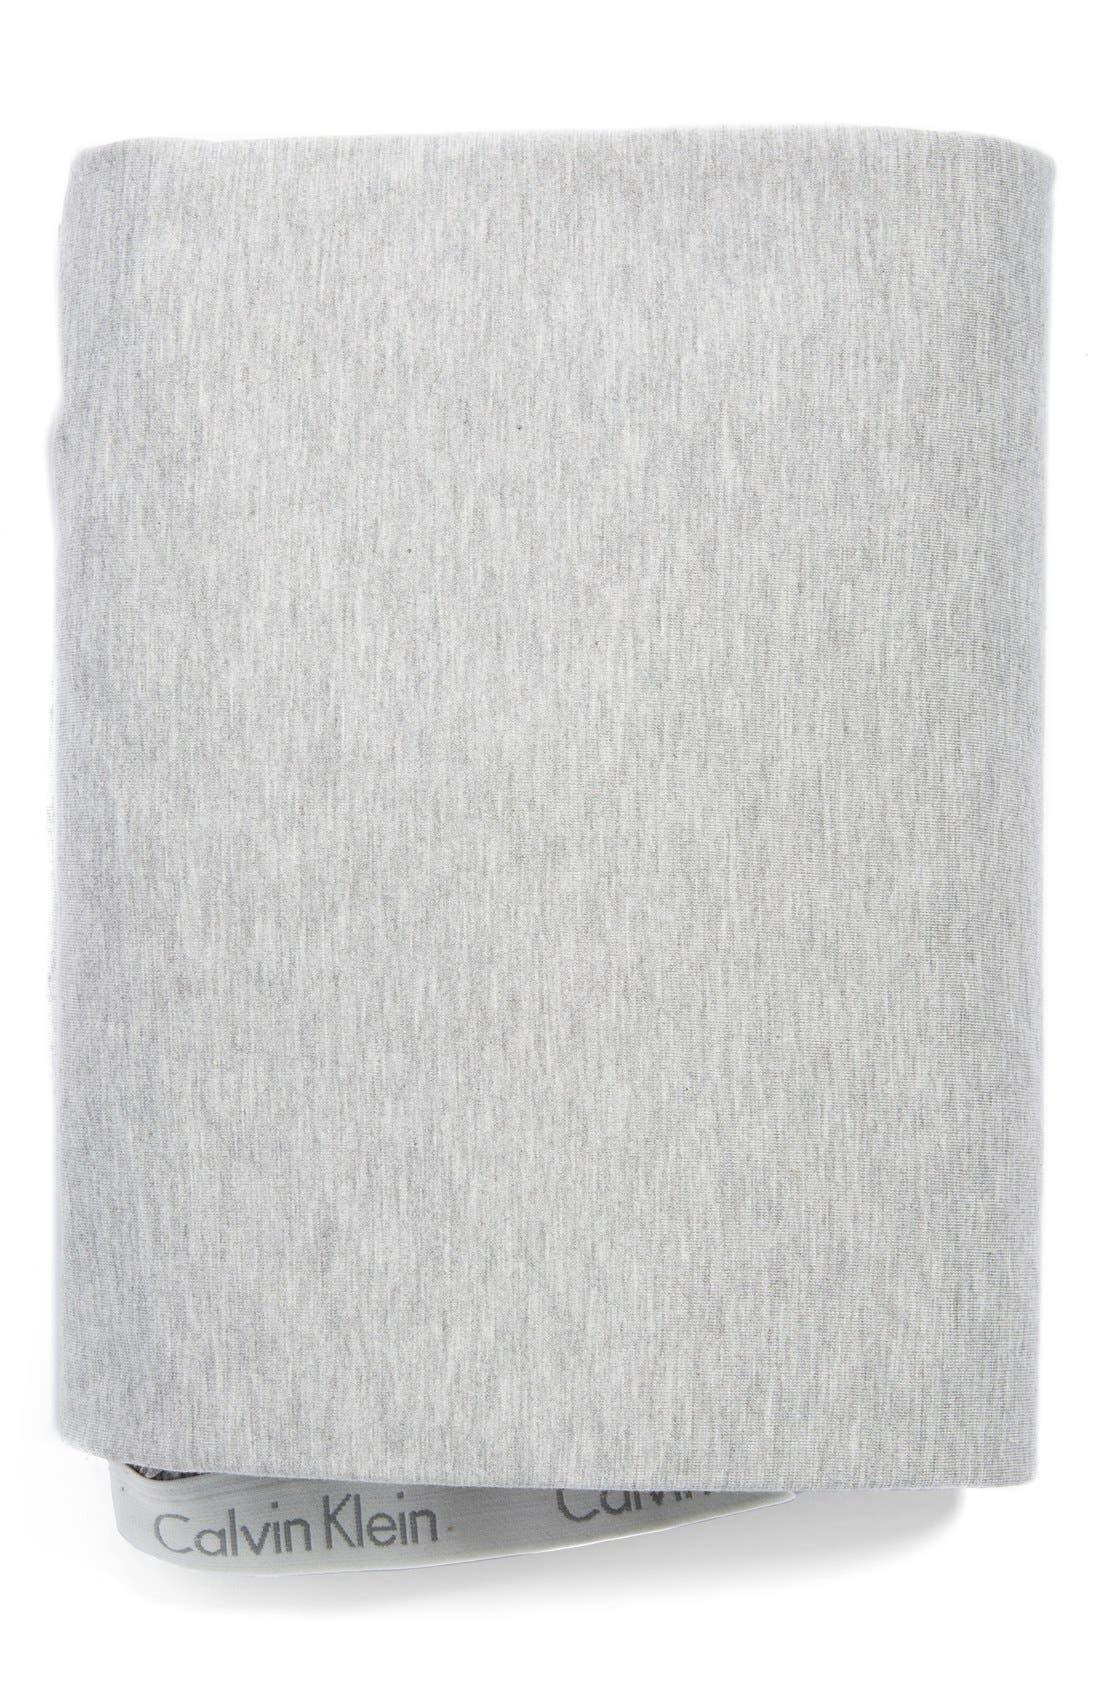 CALVIN KLEIN HOME, Modern Cotton Collection Cotton & Modal Fitted Sheet, Main thumbnail 1, color, GREY